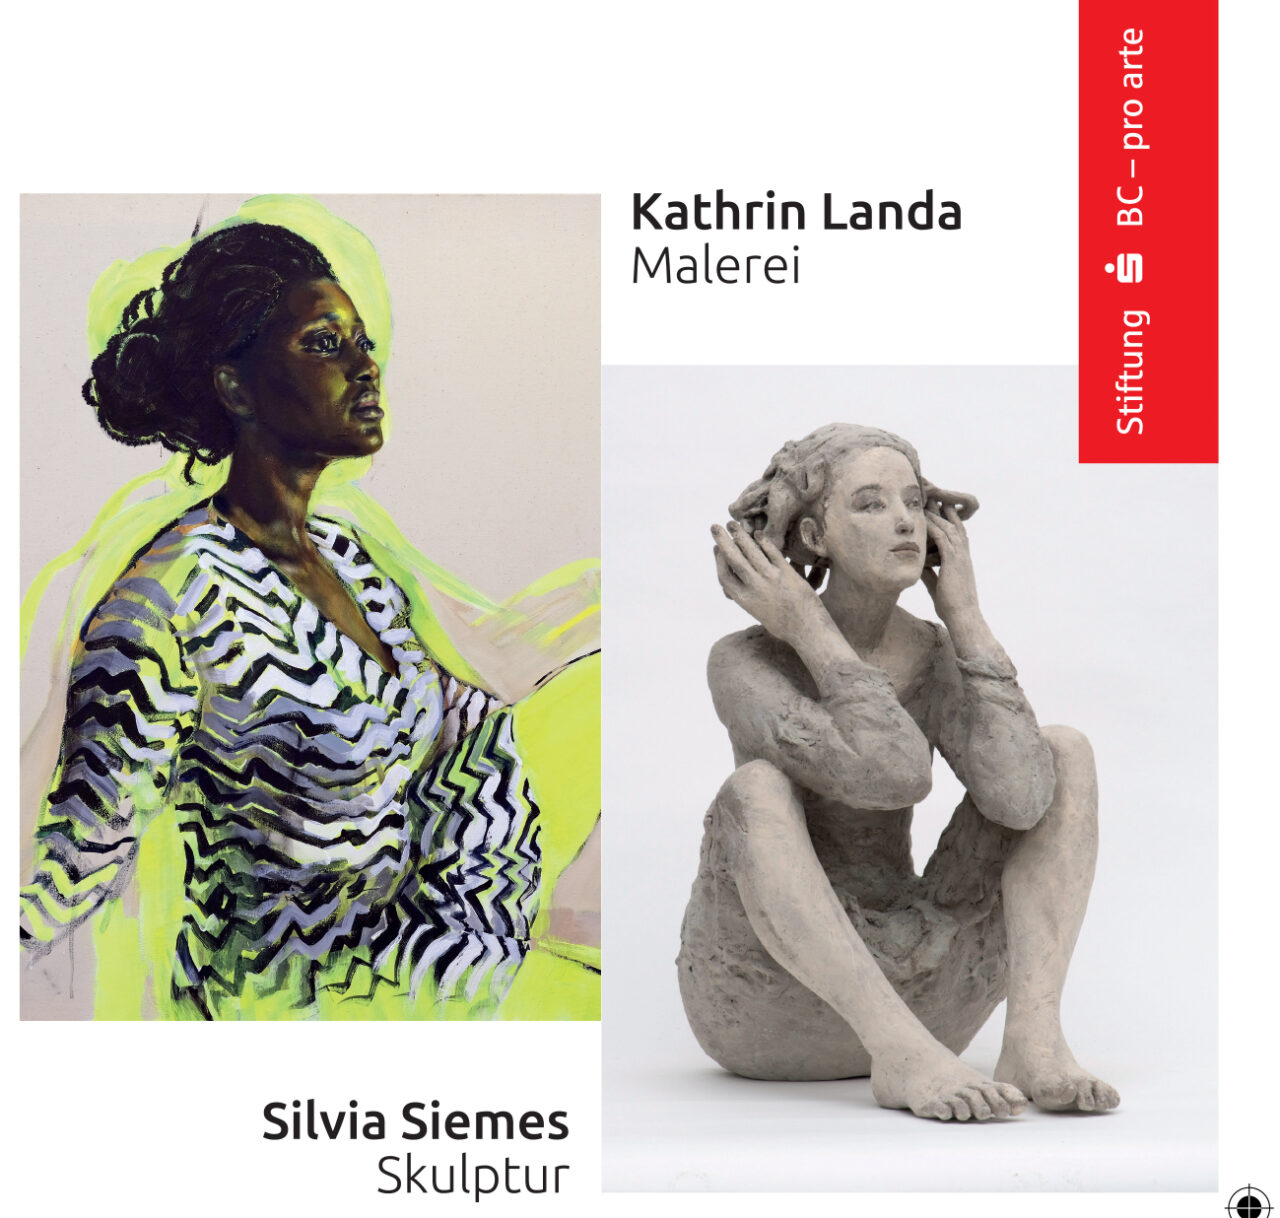 Kathrin Landa und Silvia Siemes image